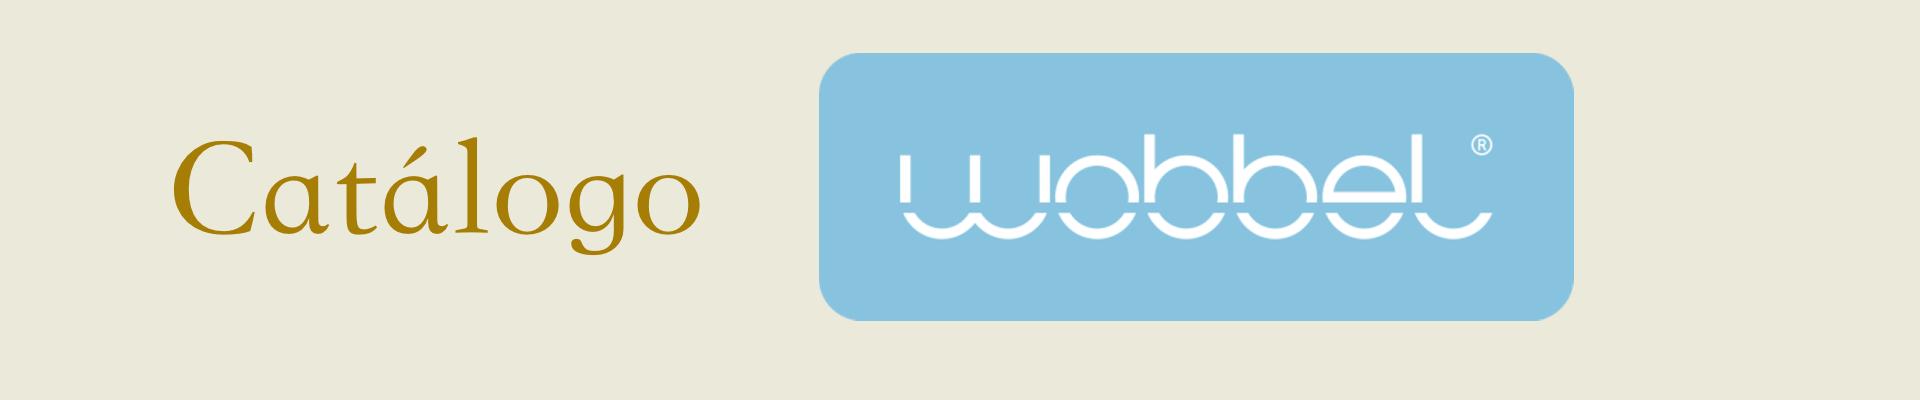 Tabla curva Wobbel. Juguetes marca Wobbel